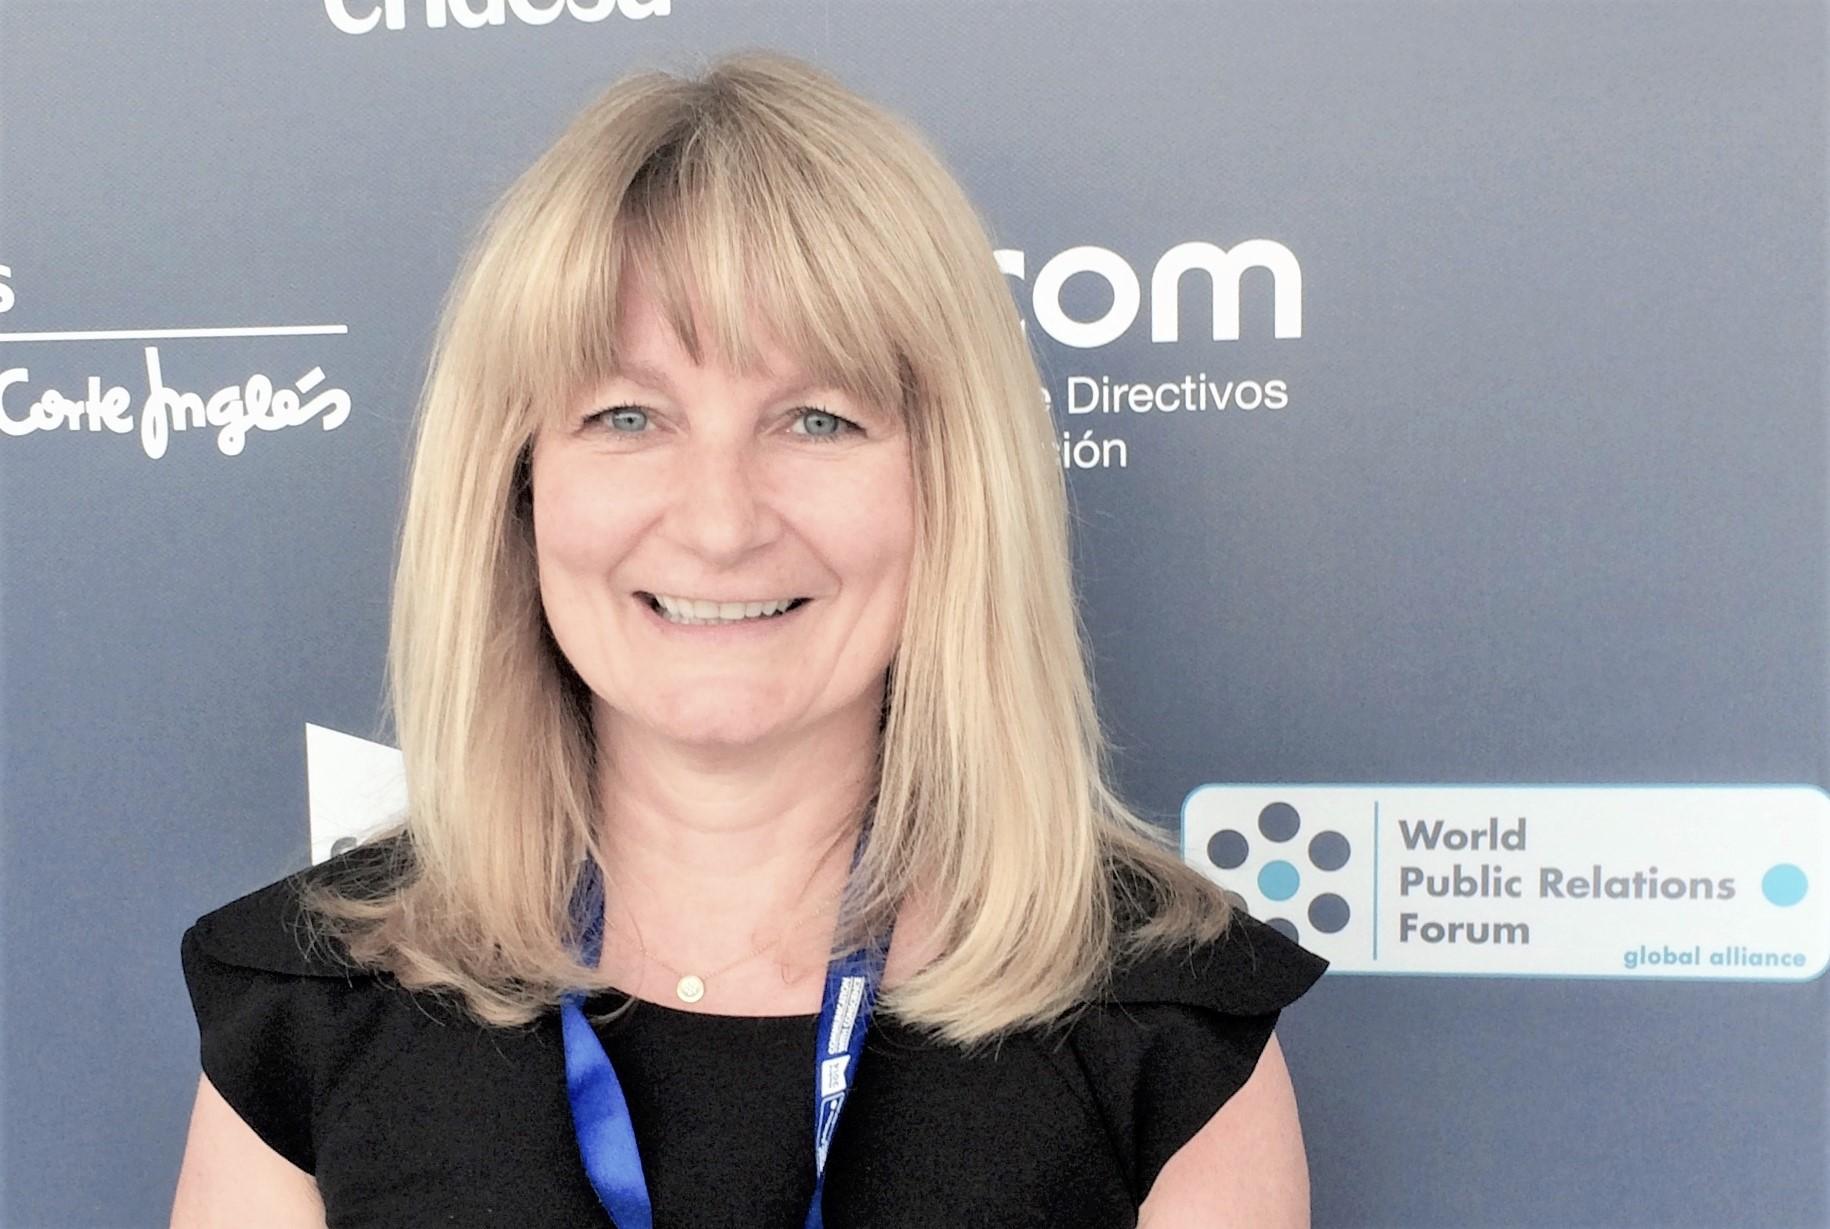 Suzanne Rouden